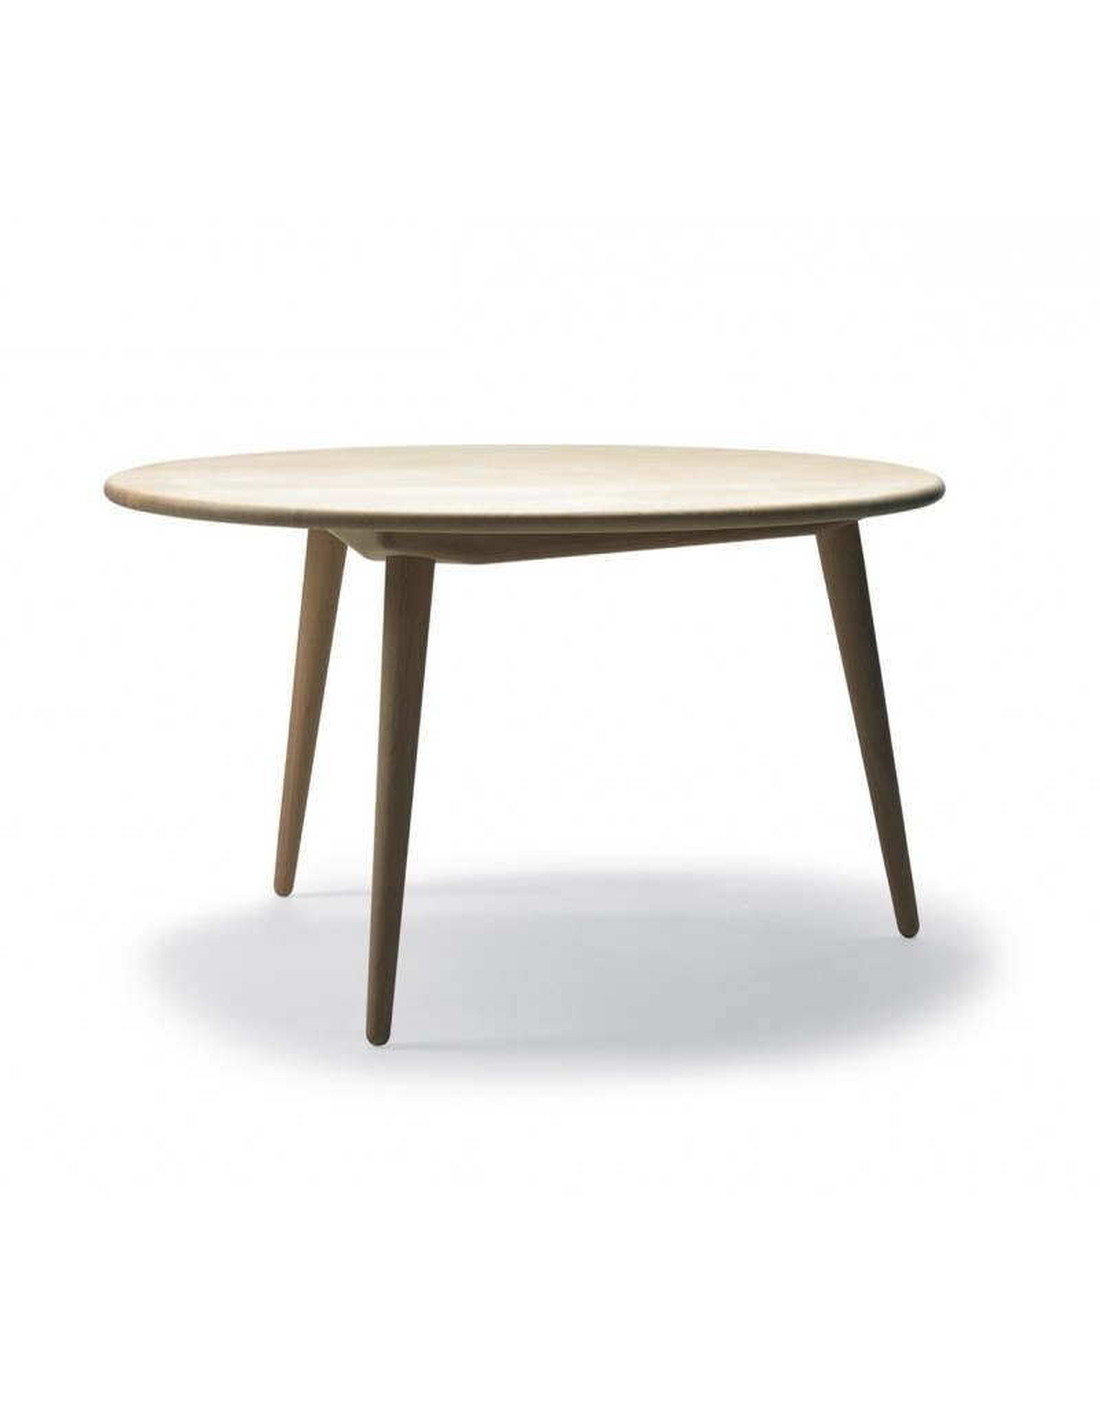 Wegner Ch008 Coffee Table: Tripede Coffee Table, Hans Wegner Design For Carl Hansen